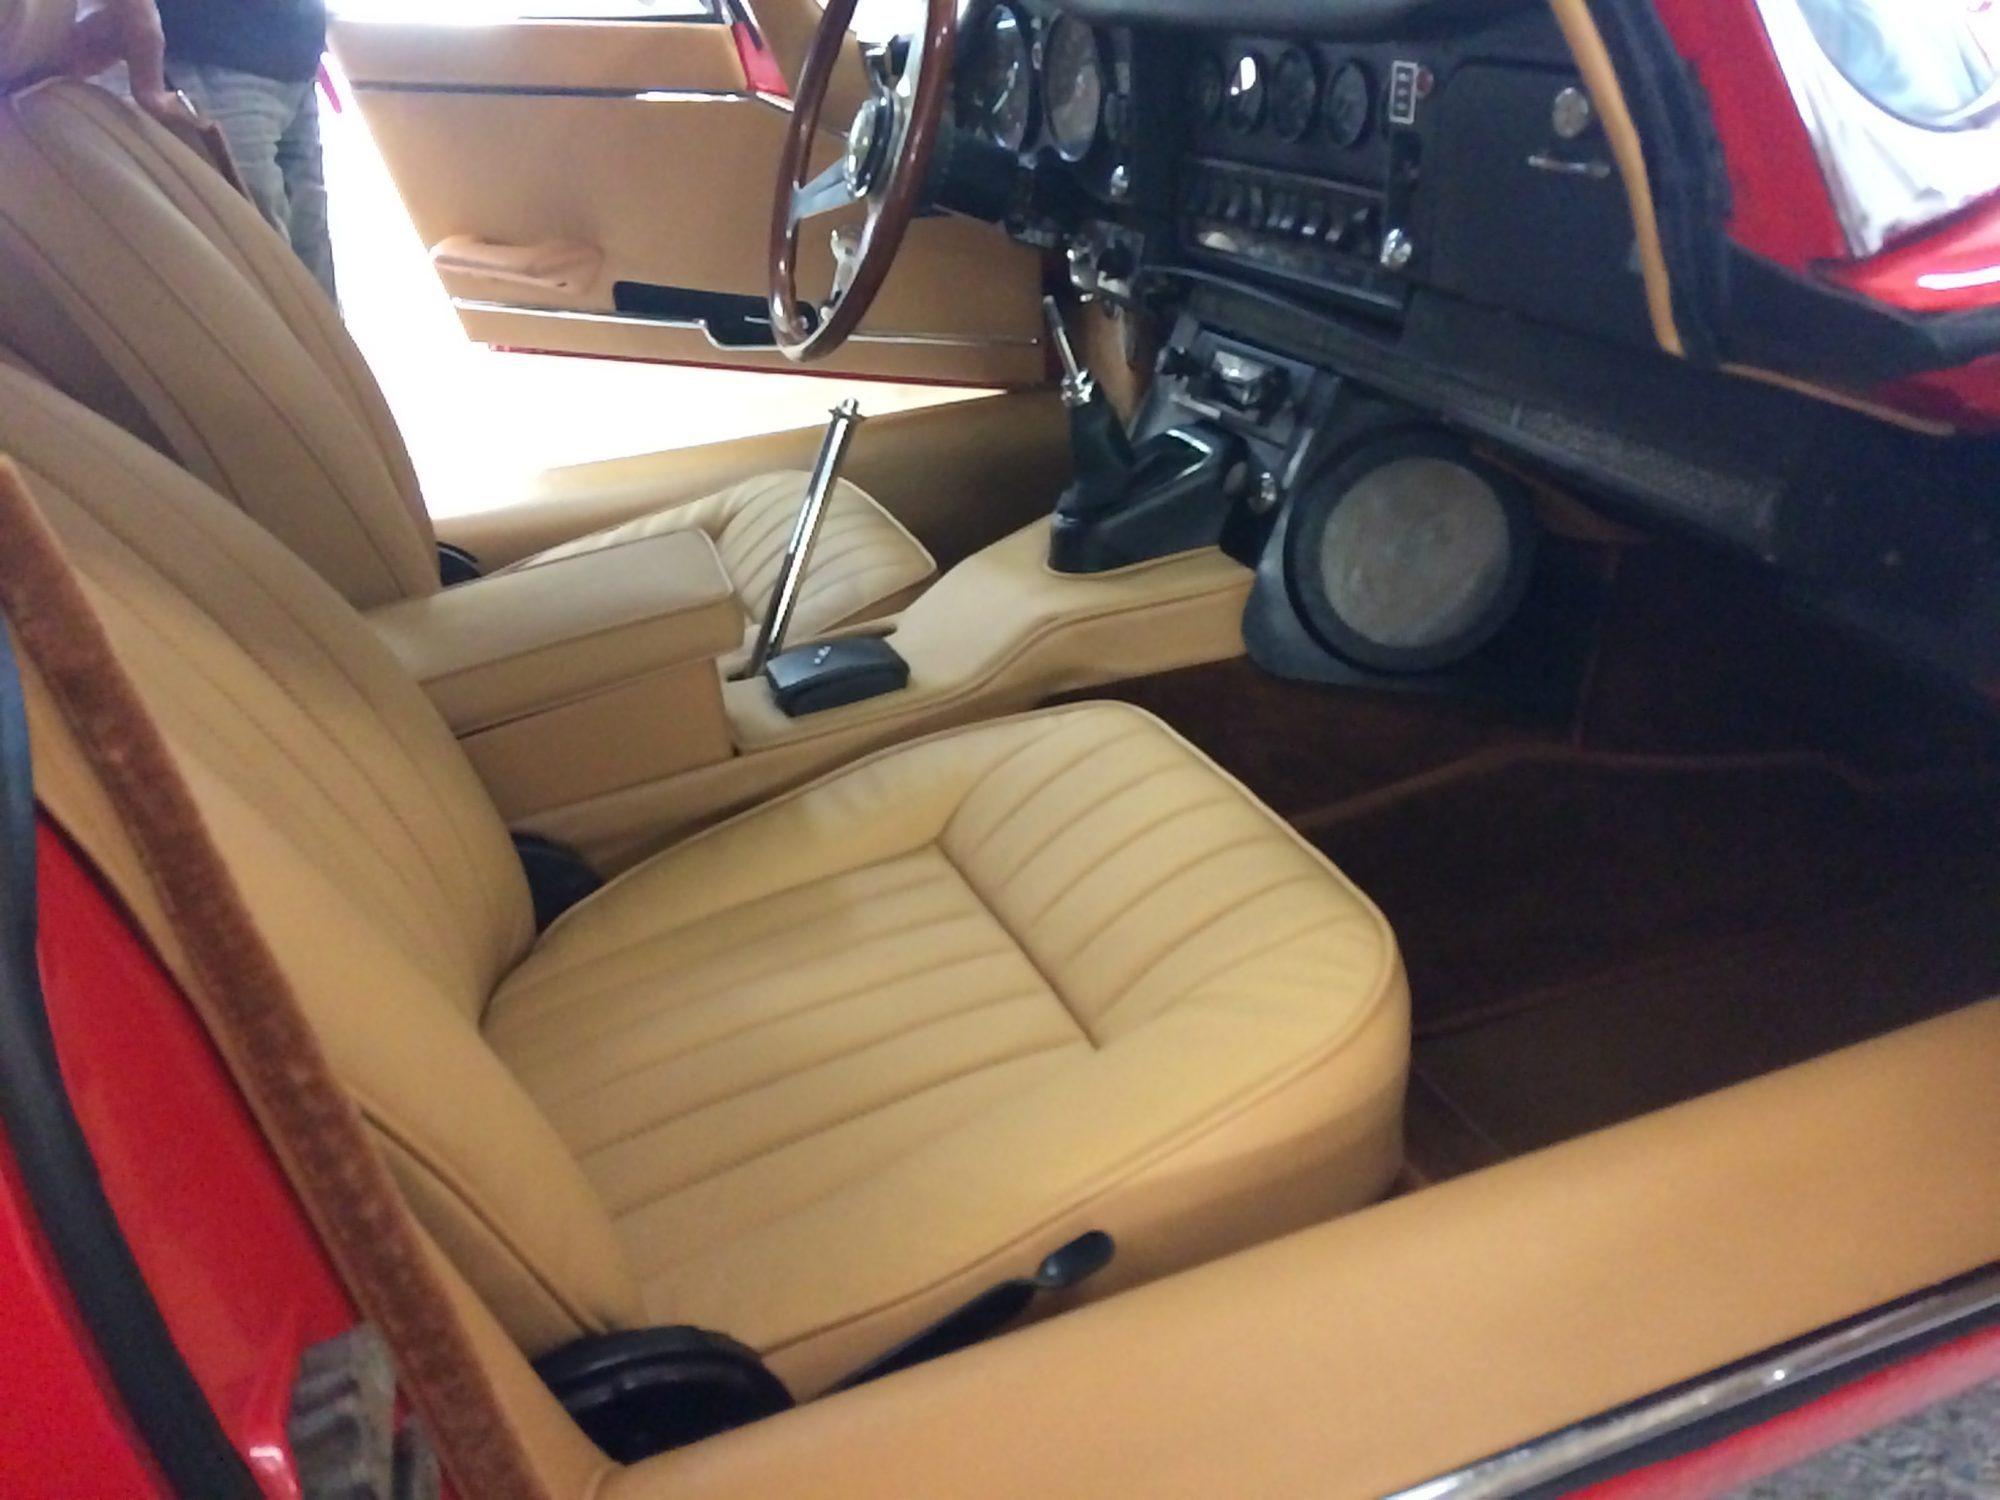 jaguar e type series 2 fhc interior kit cambridge concours. Black Bedroom Furniture Sets. Home Design Ideas